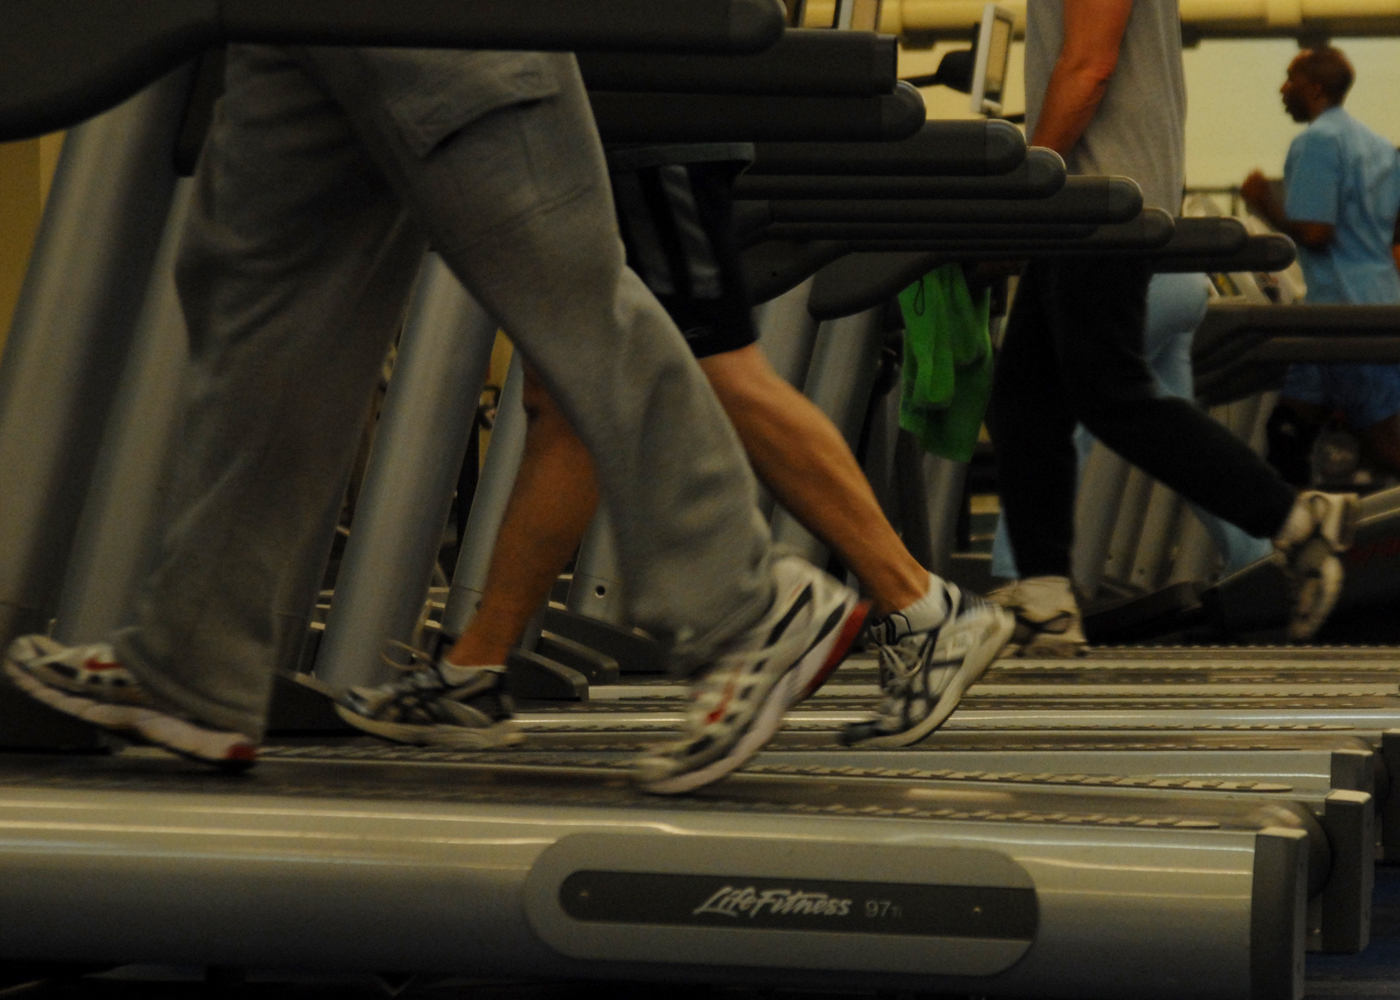 Treadmills_at_gym